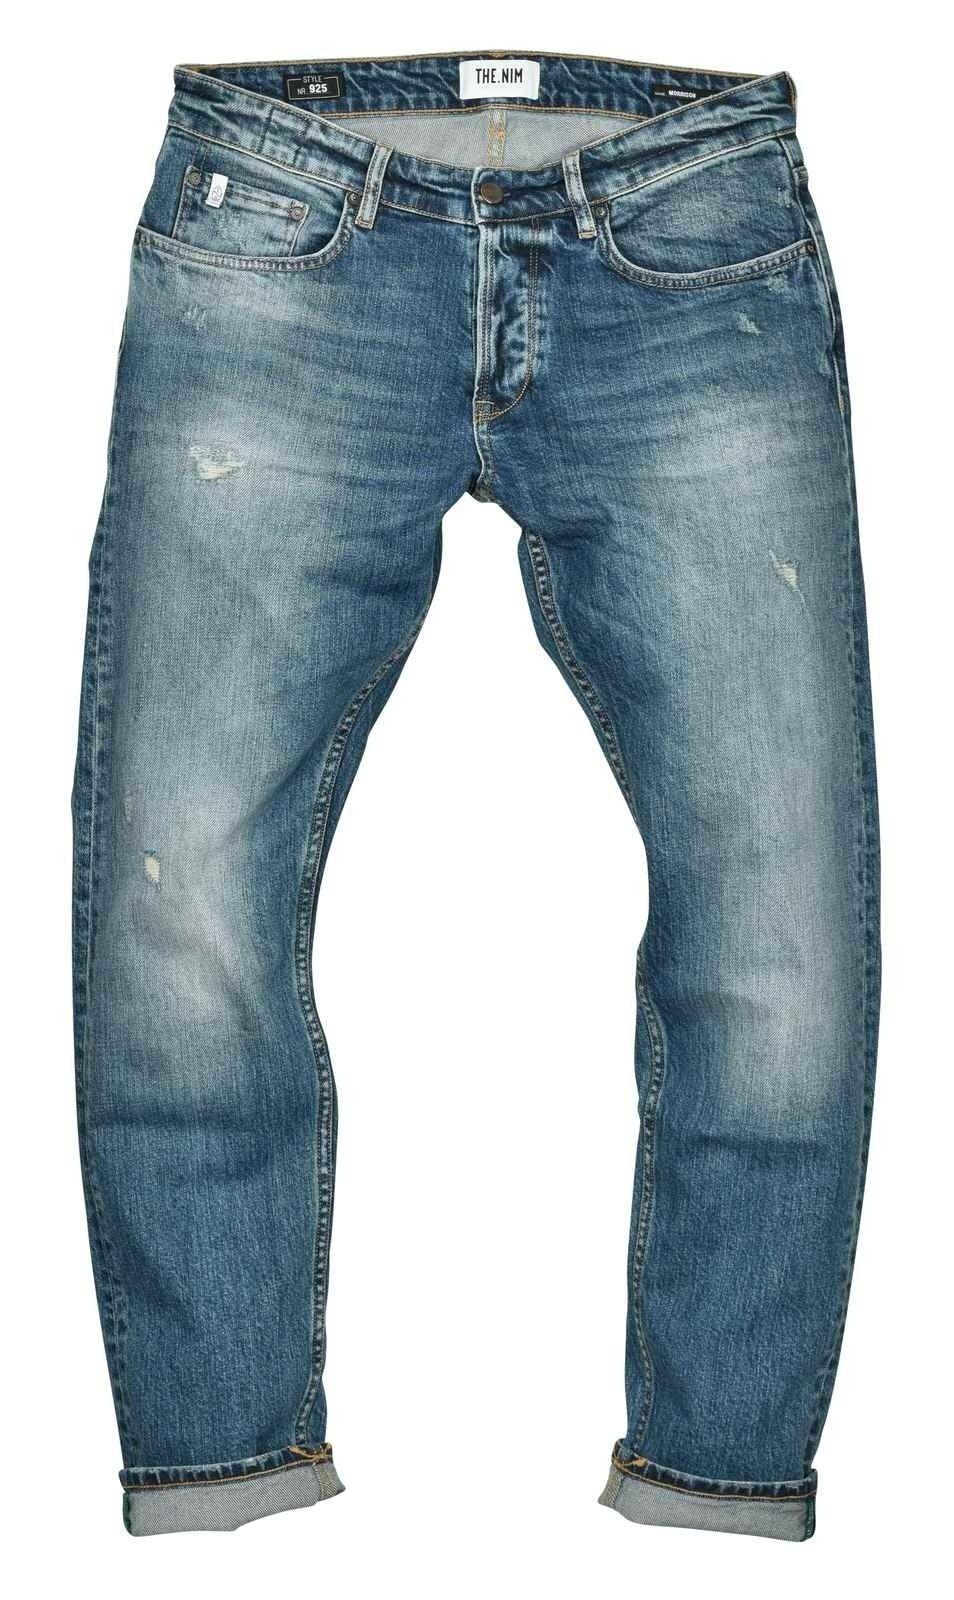 THE.NIM - Herren Jeans - Morrison Man Jeans Tapered Fit - Special Destroyed